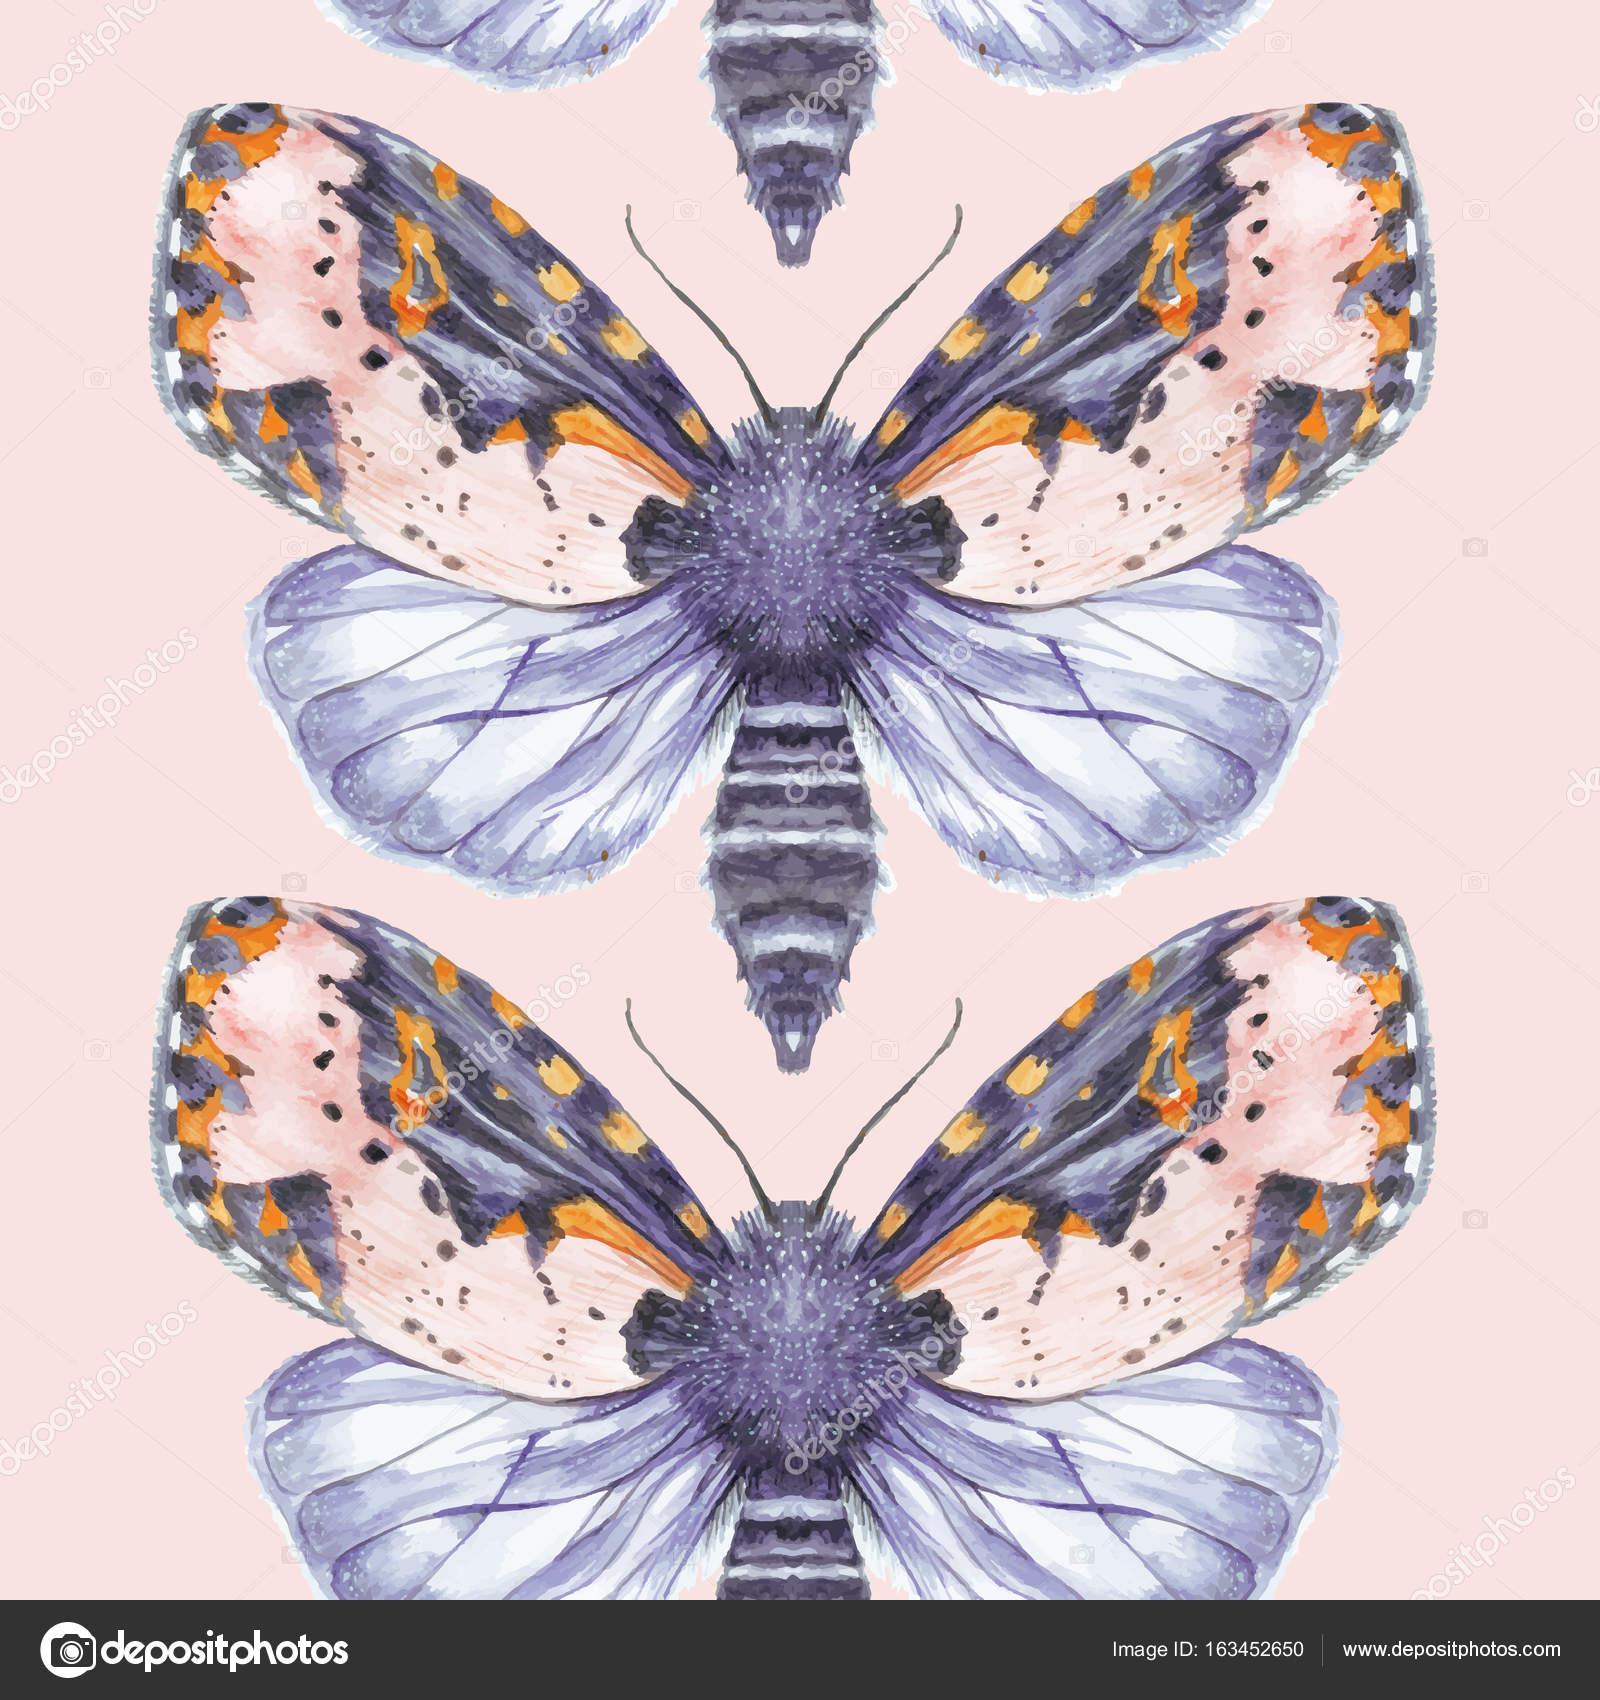 Pintar Dibujo Acuarela shaggy mariposa osito fondo, brillante para ...